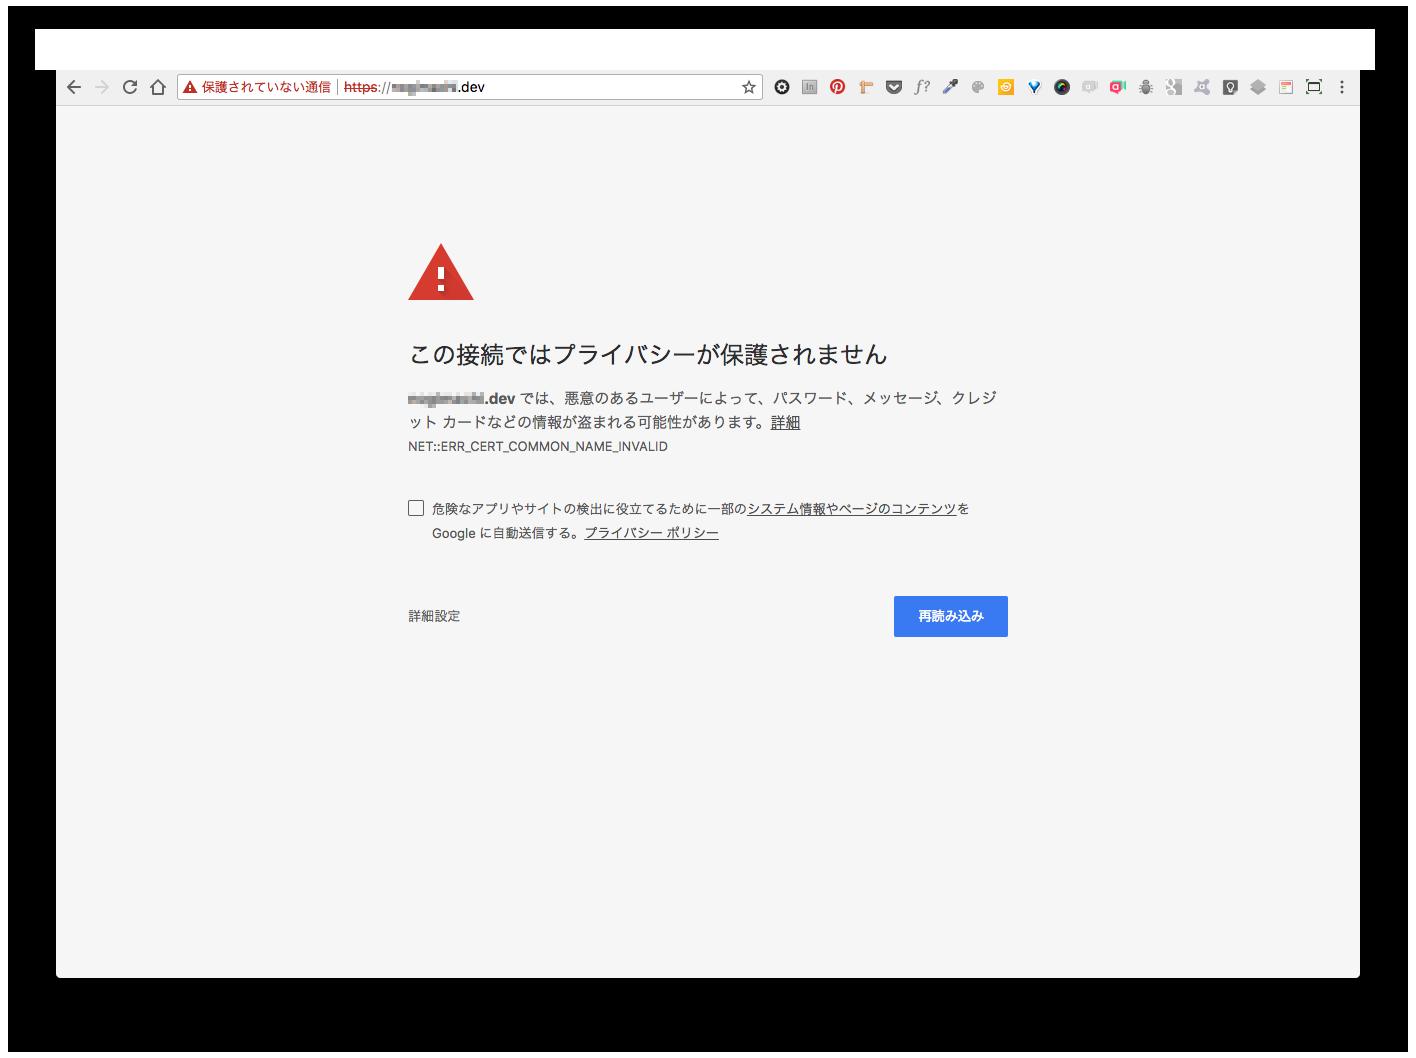 Google Chromeで .devがhttpsにリダイレクトされる問題